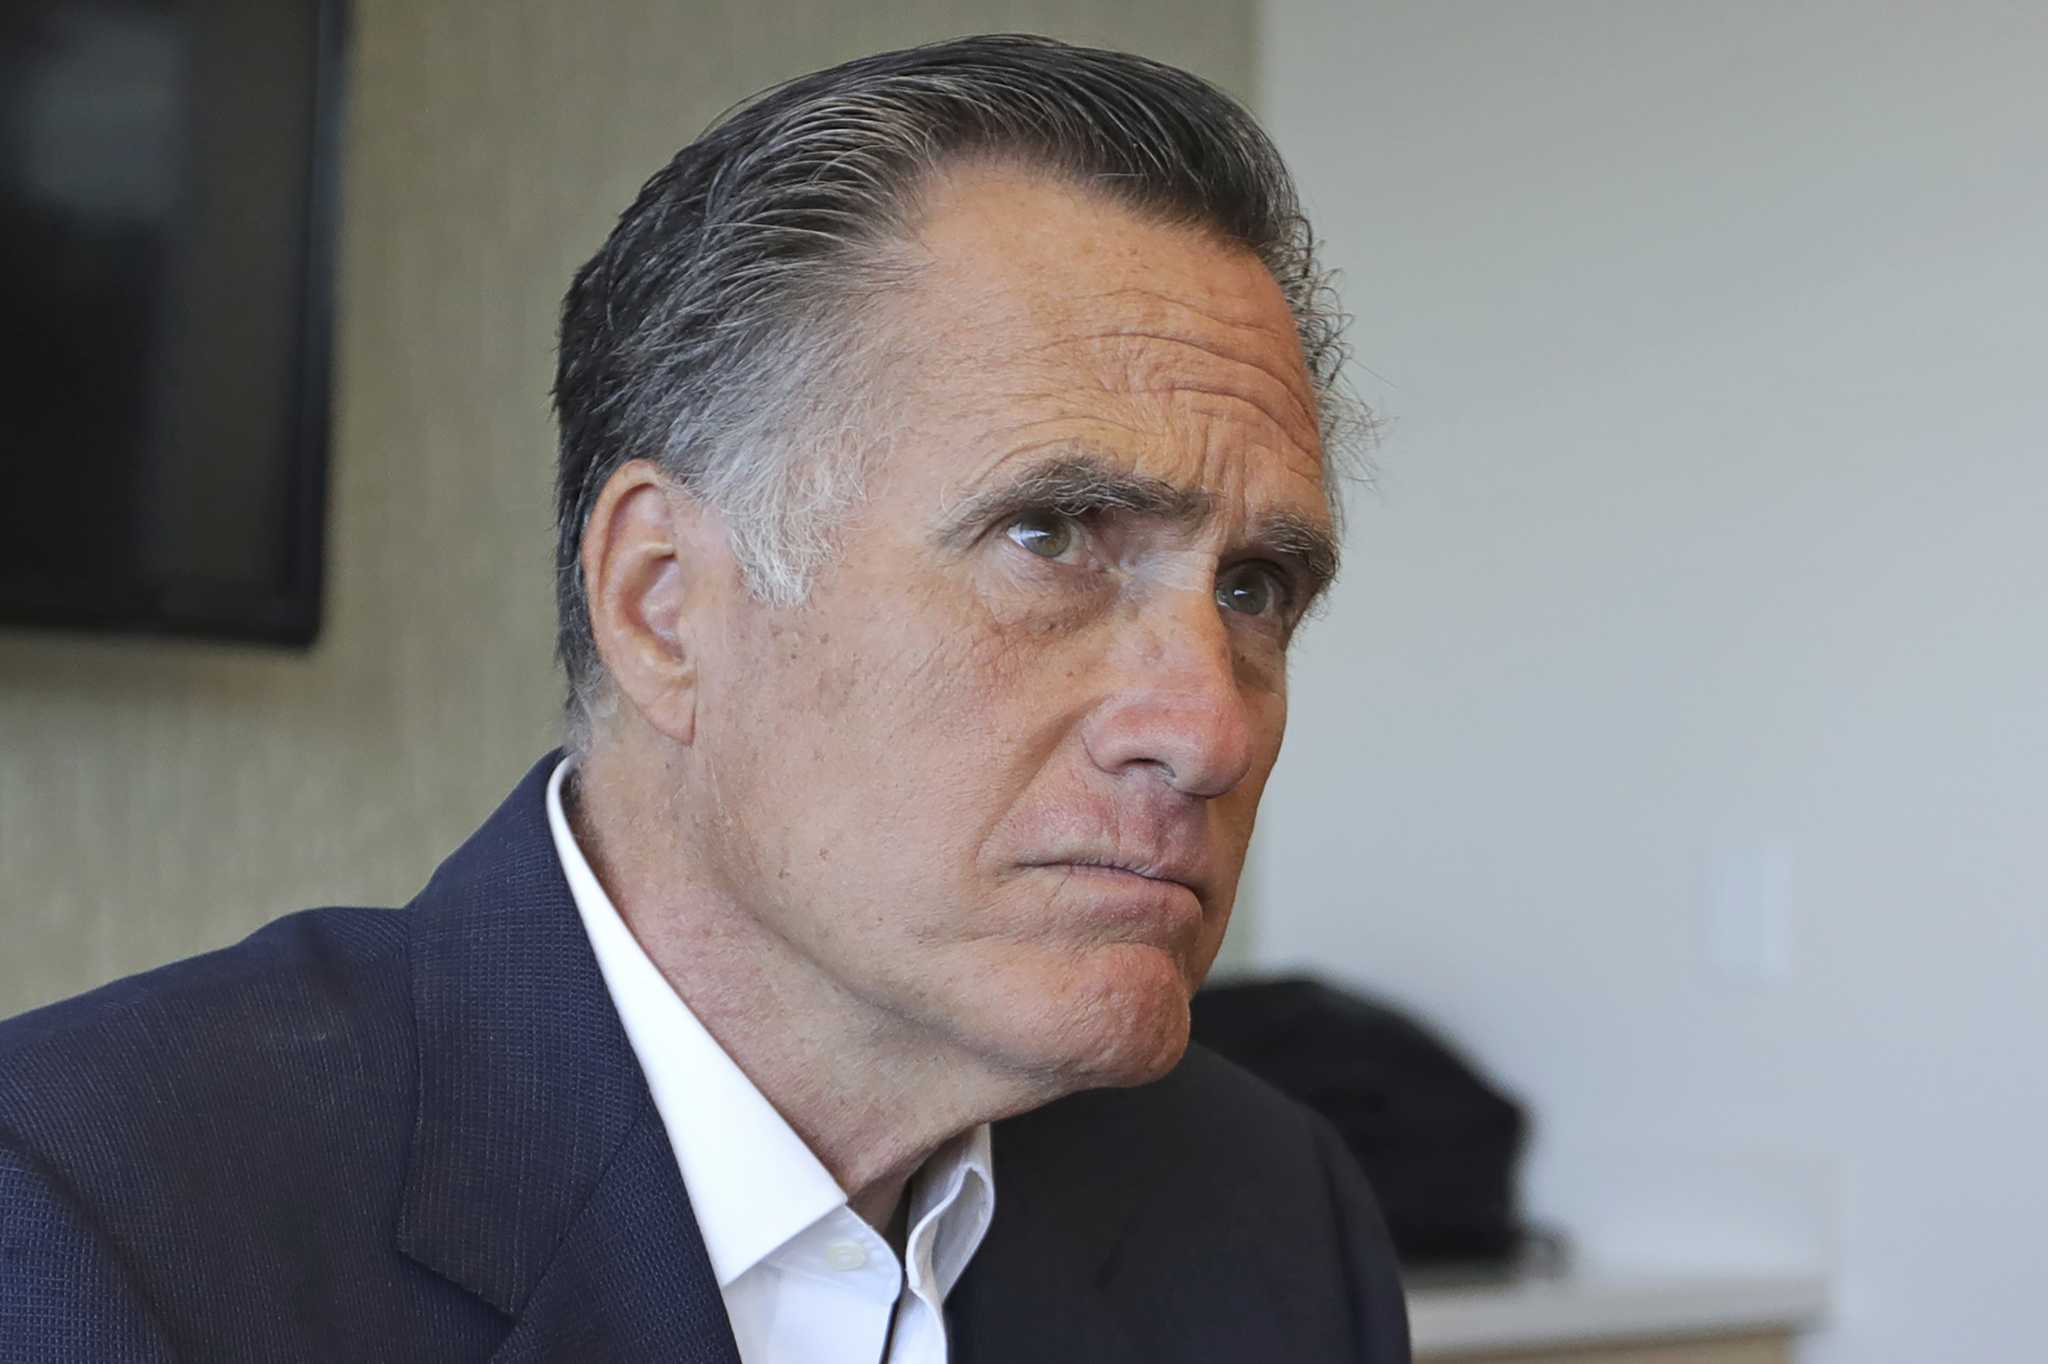 Mitt Romney admits to running secret Twitter account under the alias 'Pierre Delecto'